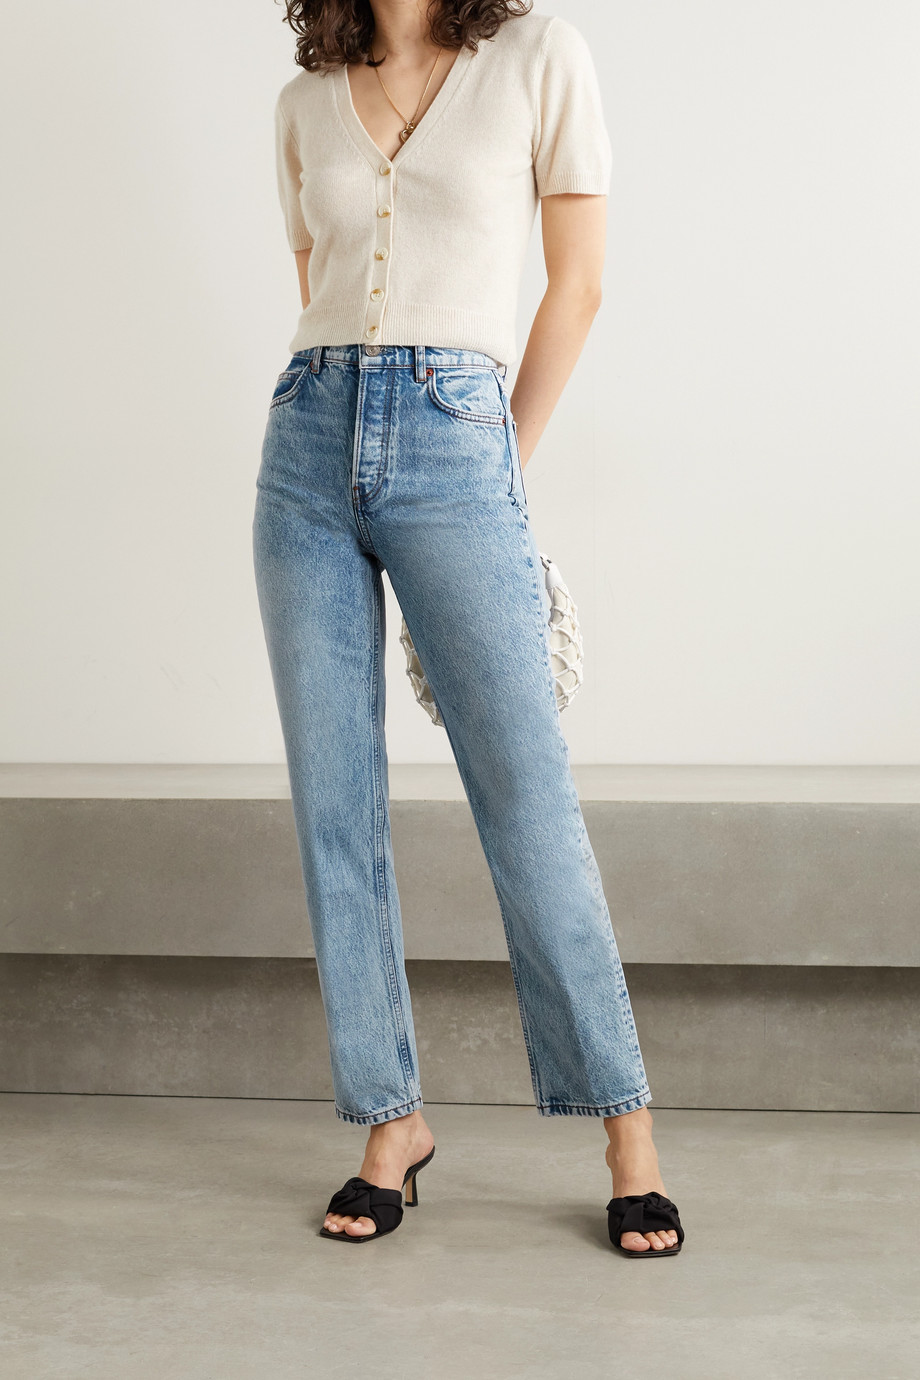 Reformation Cynthia high-rise straight-leg jeans